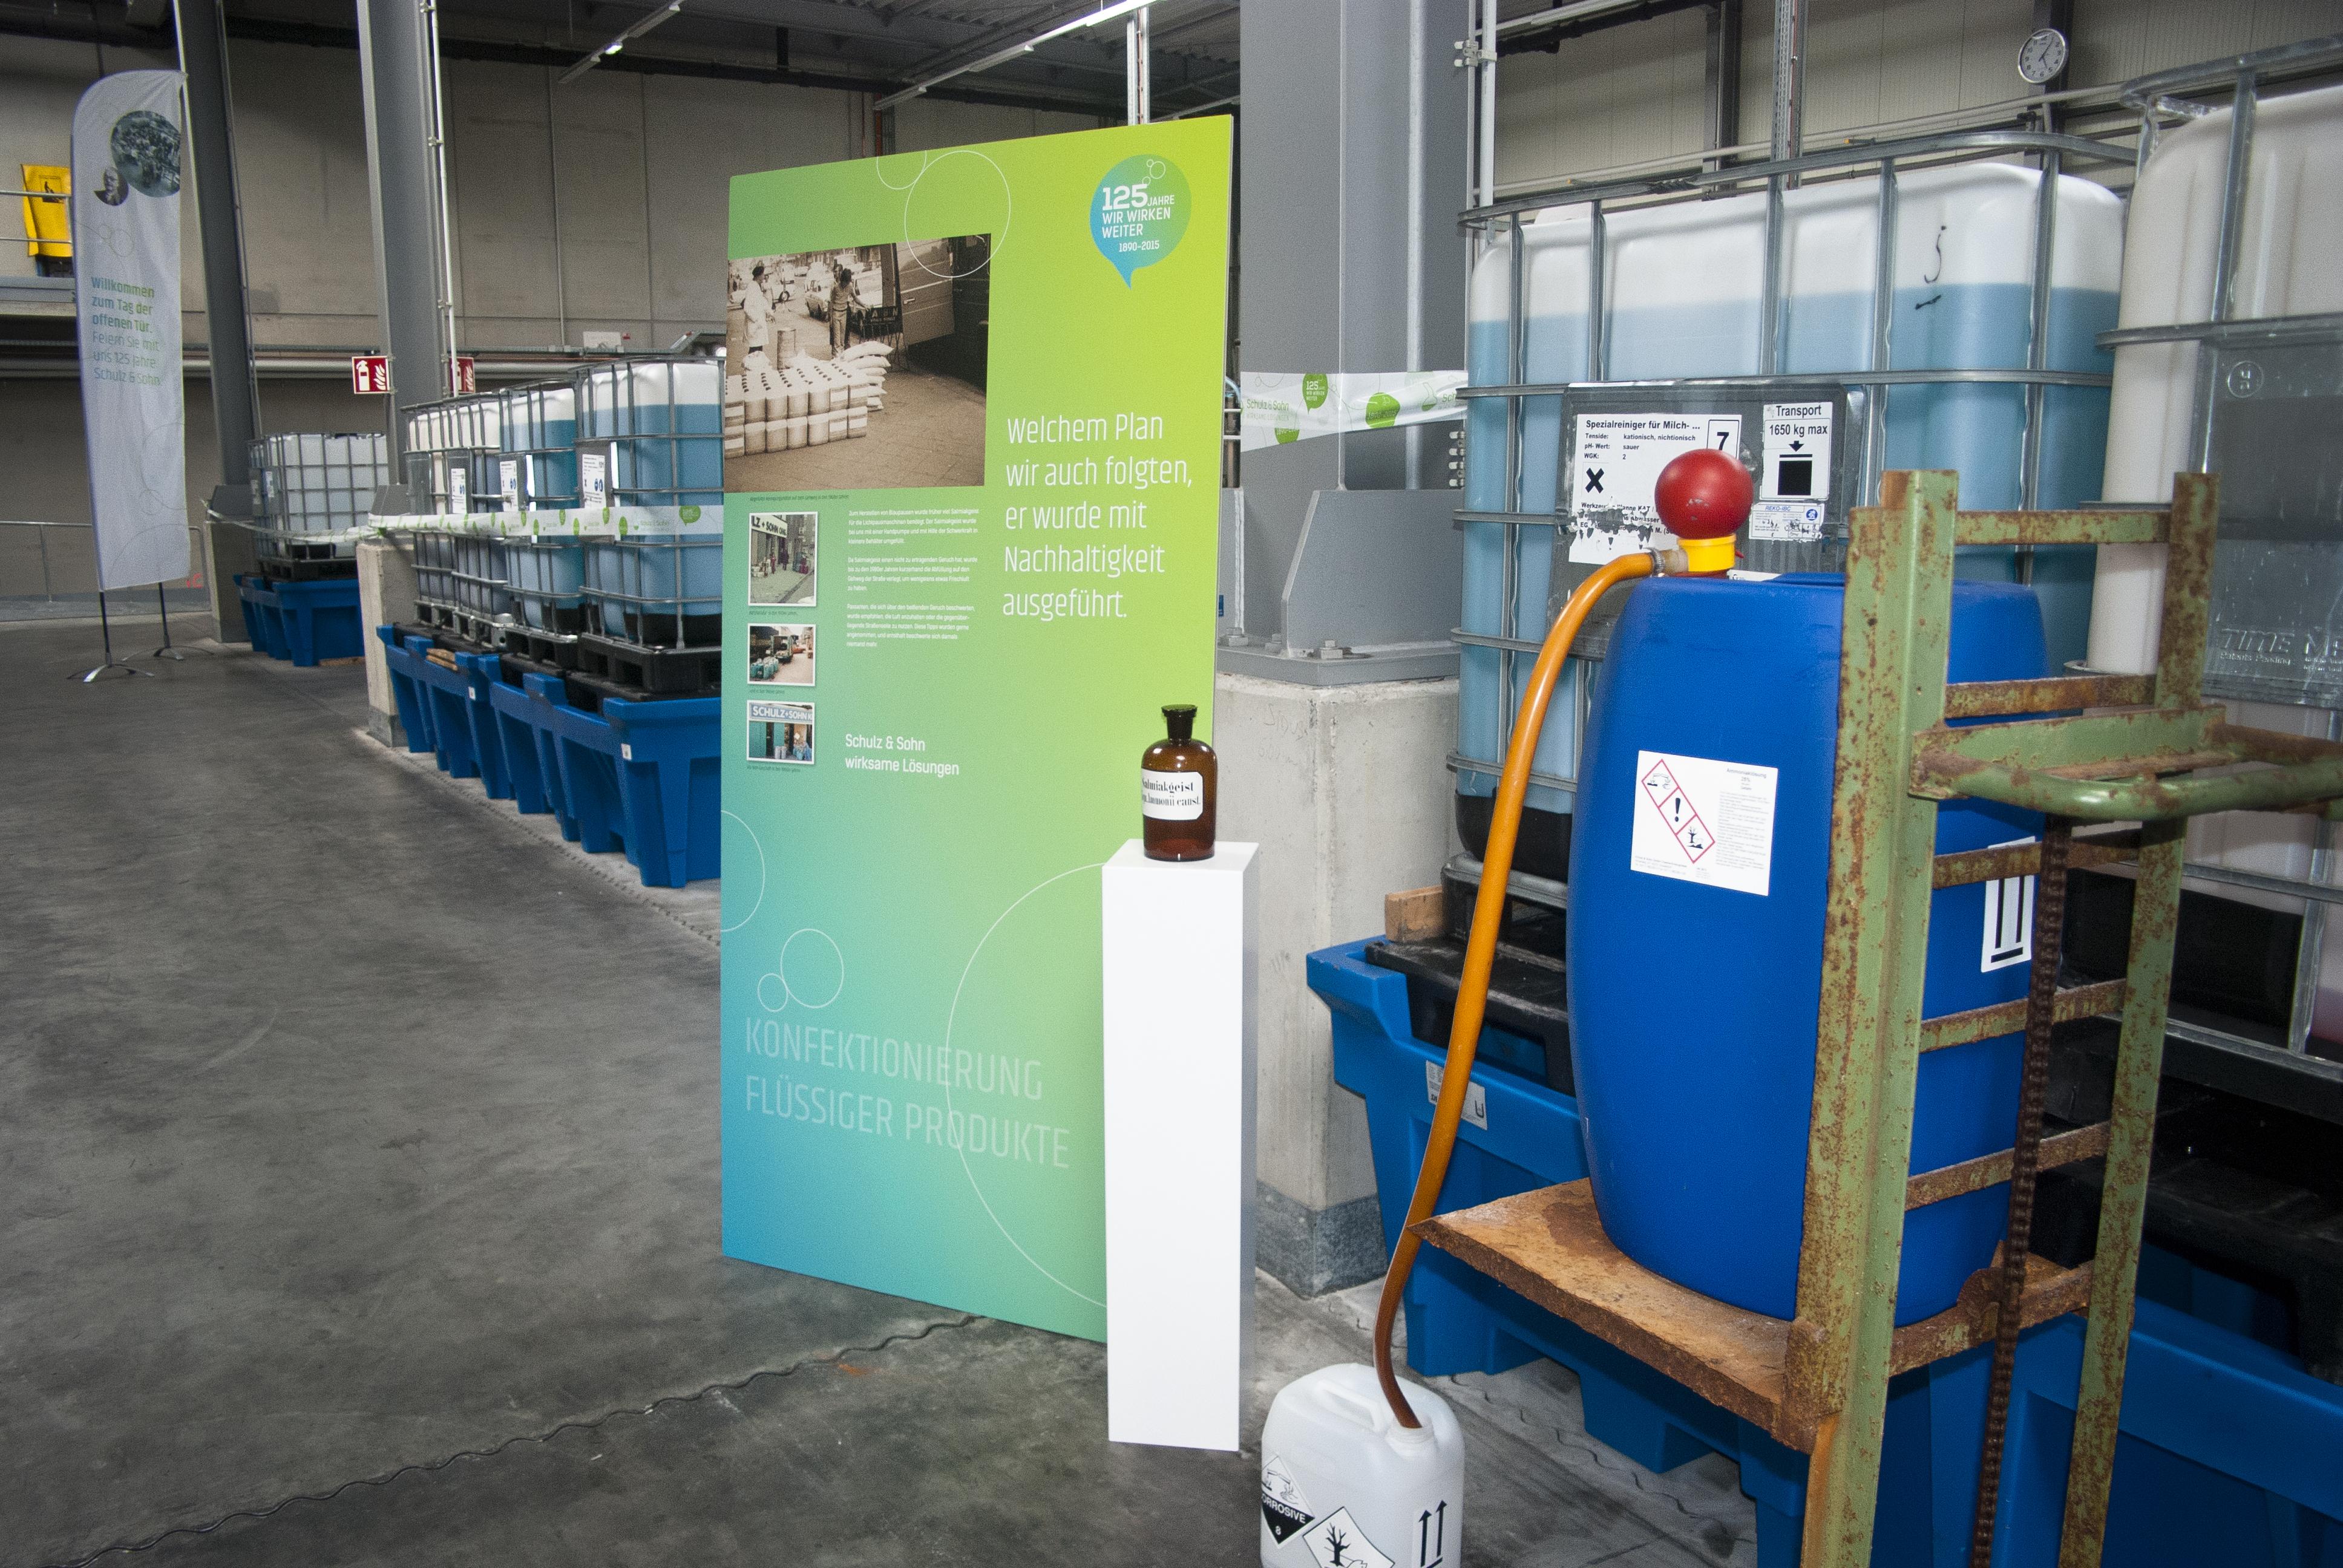 S&S Station Konf-fl-Produkte